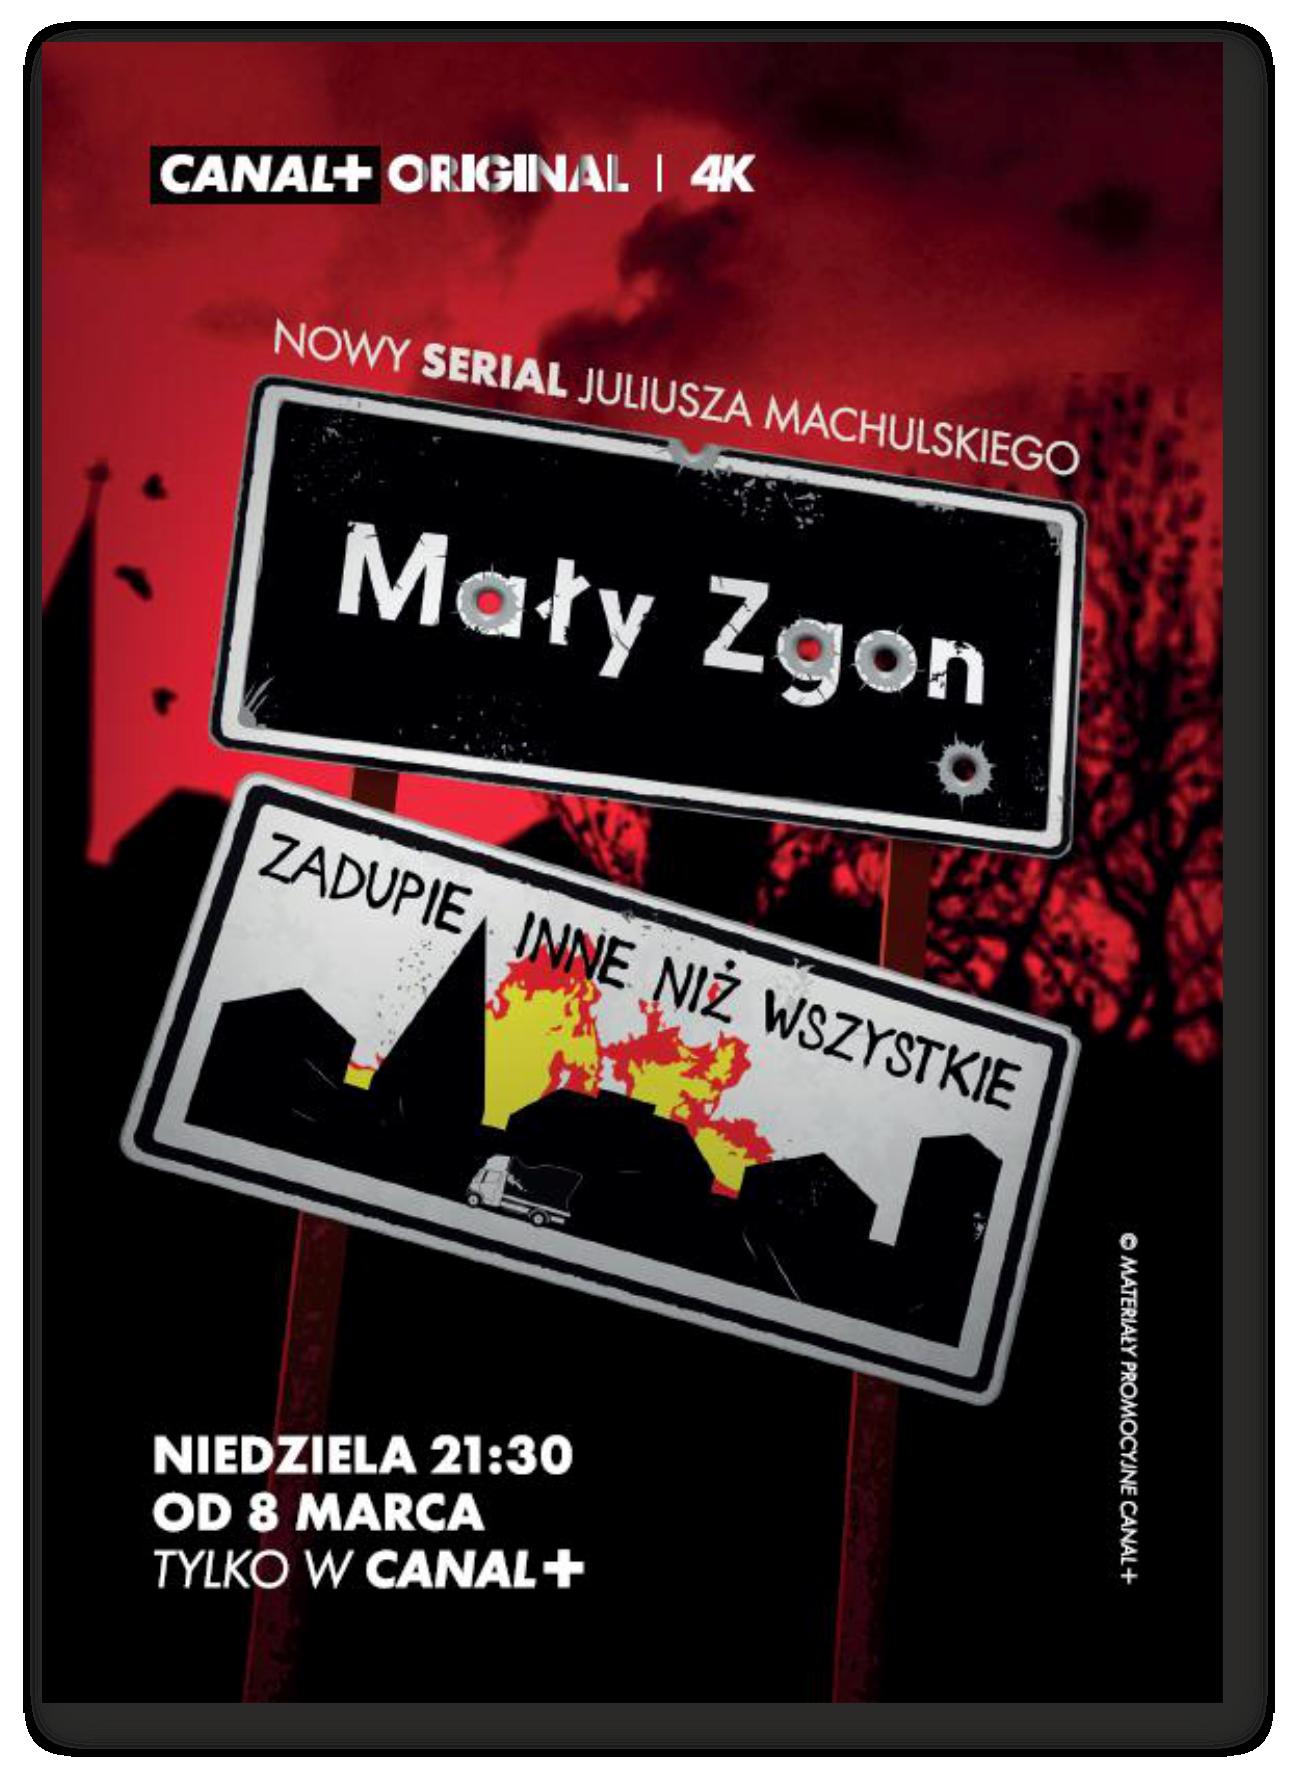 reklama_maly_zgon_1.jpg